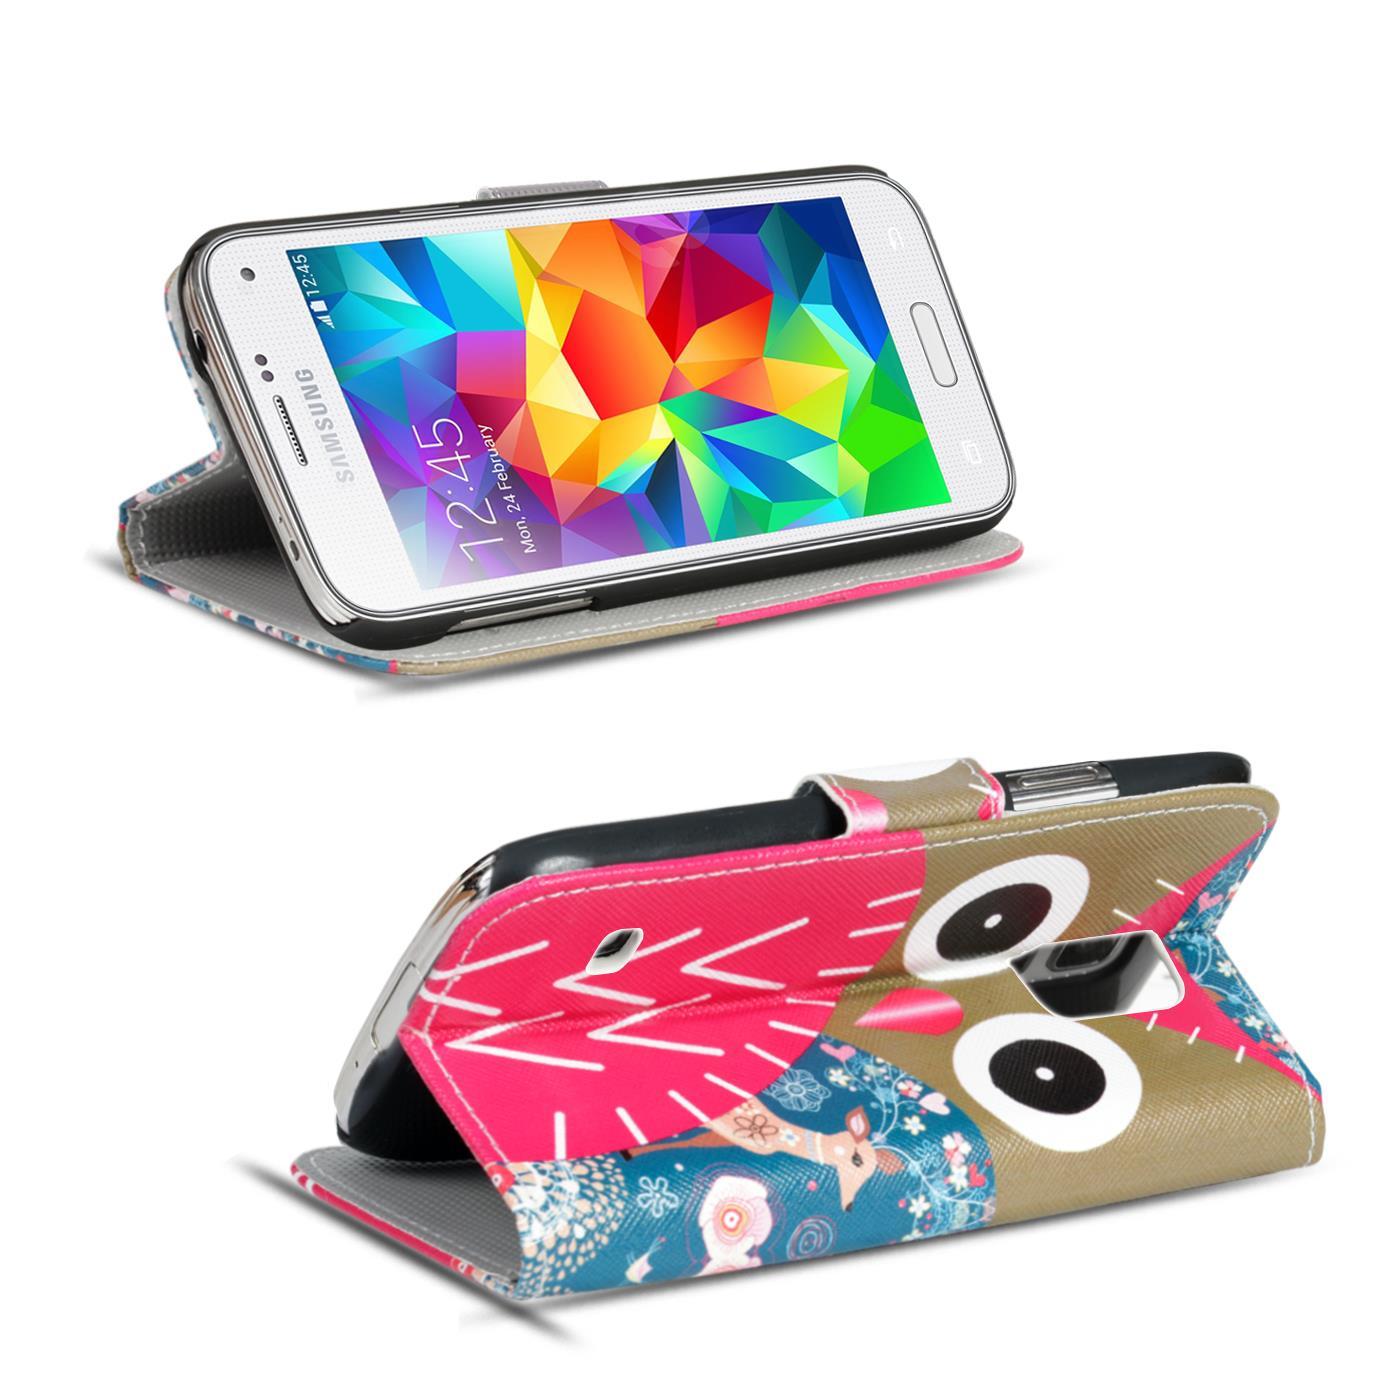 handy h lle samsung galaxy s5 mini flip cover case schutz. Black Bedroom Furniture Sets. Home Design Ideas